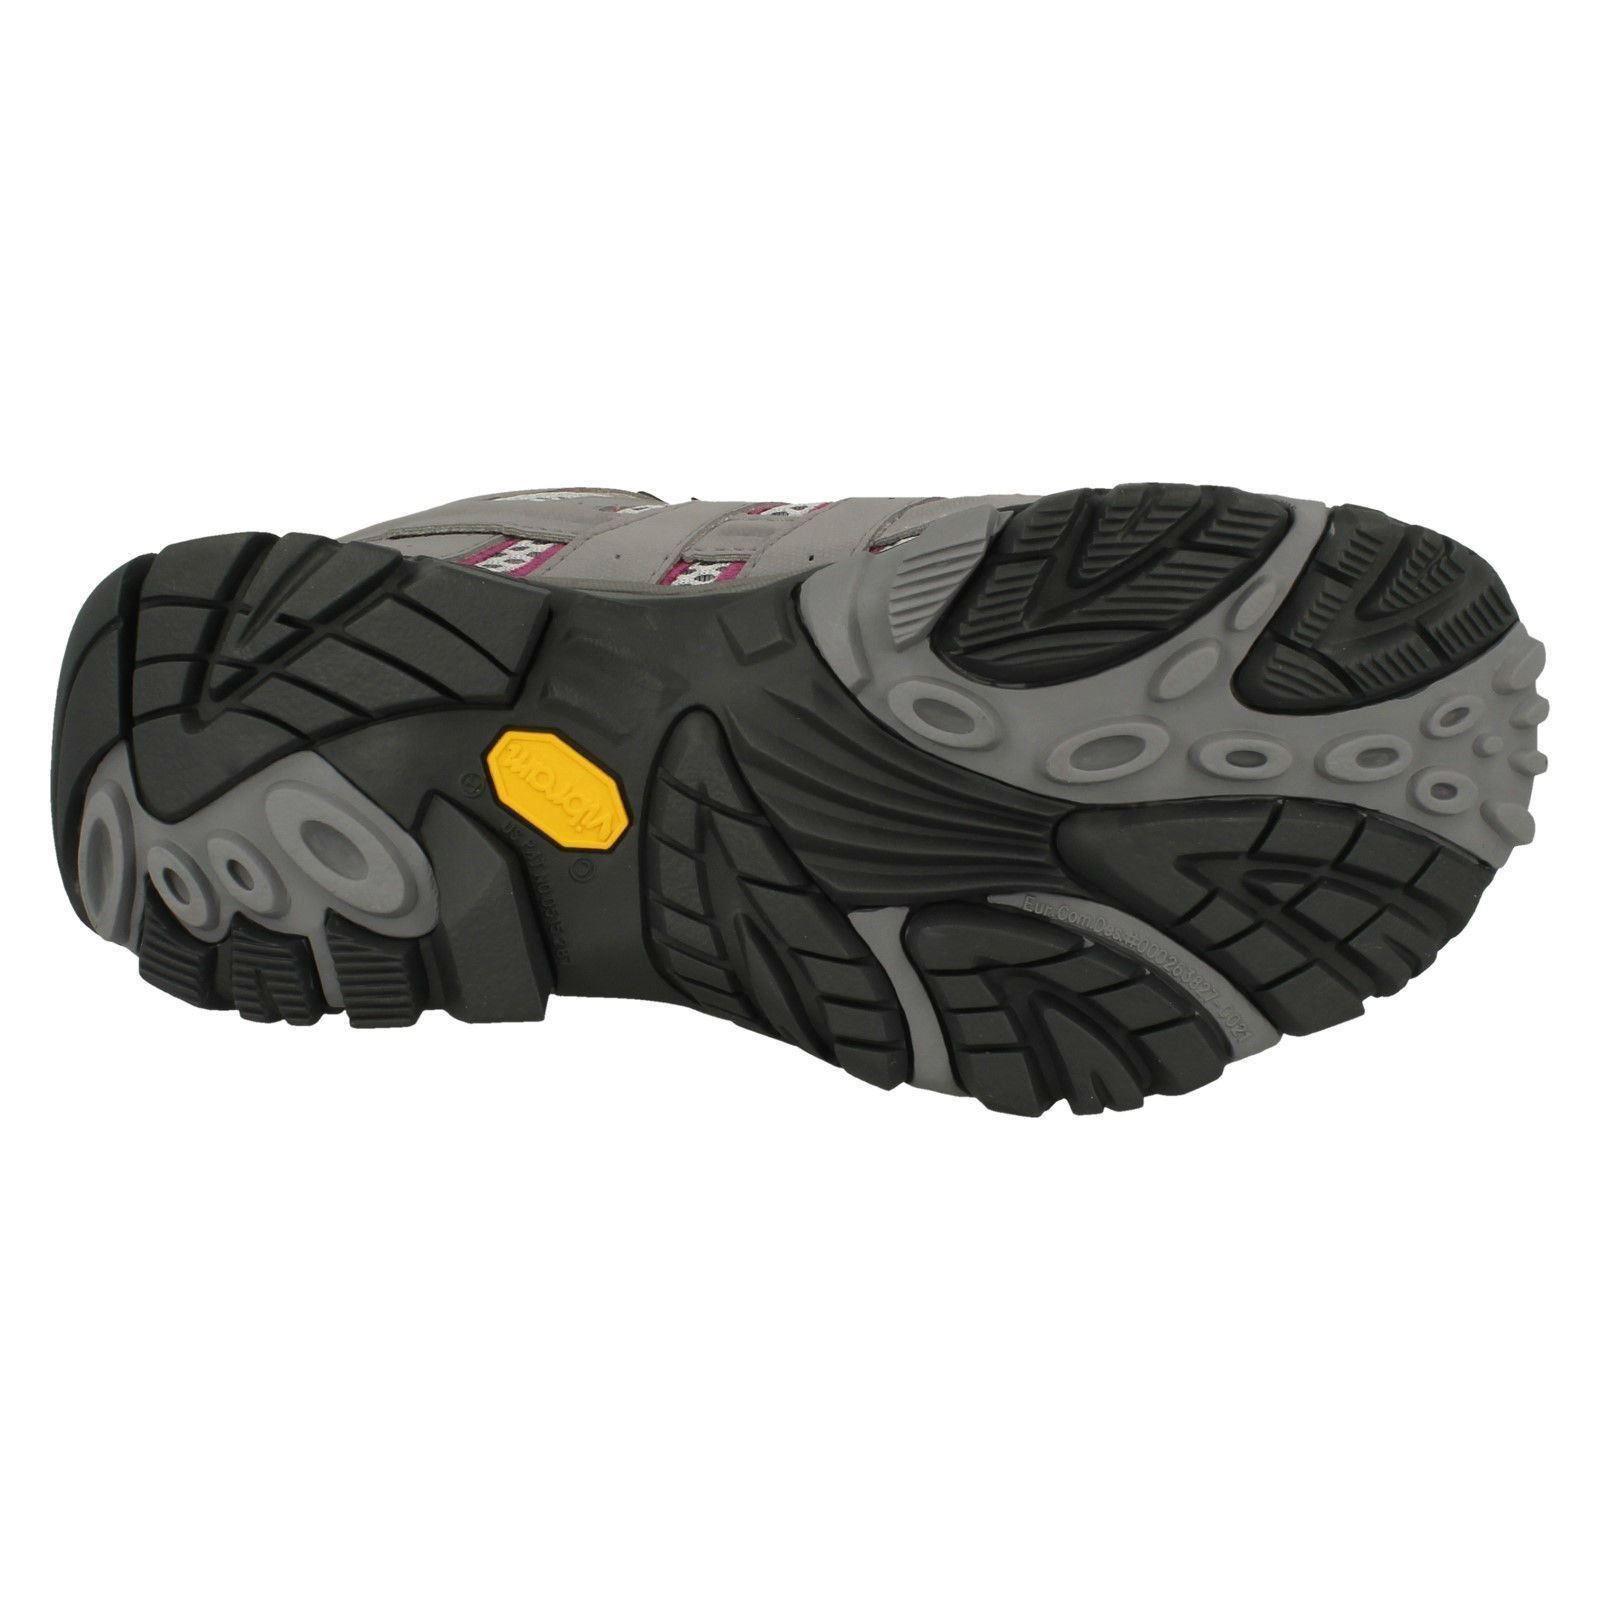 grigio ghiaccio J65263' 'moab Ladies Boots grigio Merrell Walking Gtx Mid 2 0xzwO8Oaq